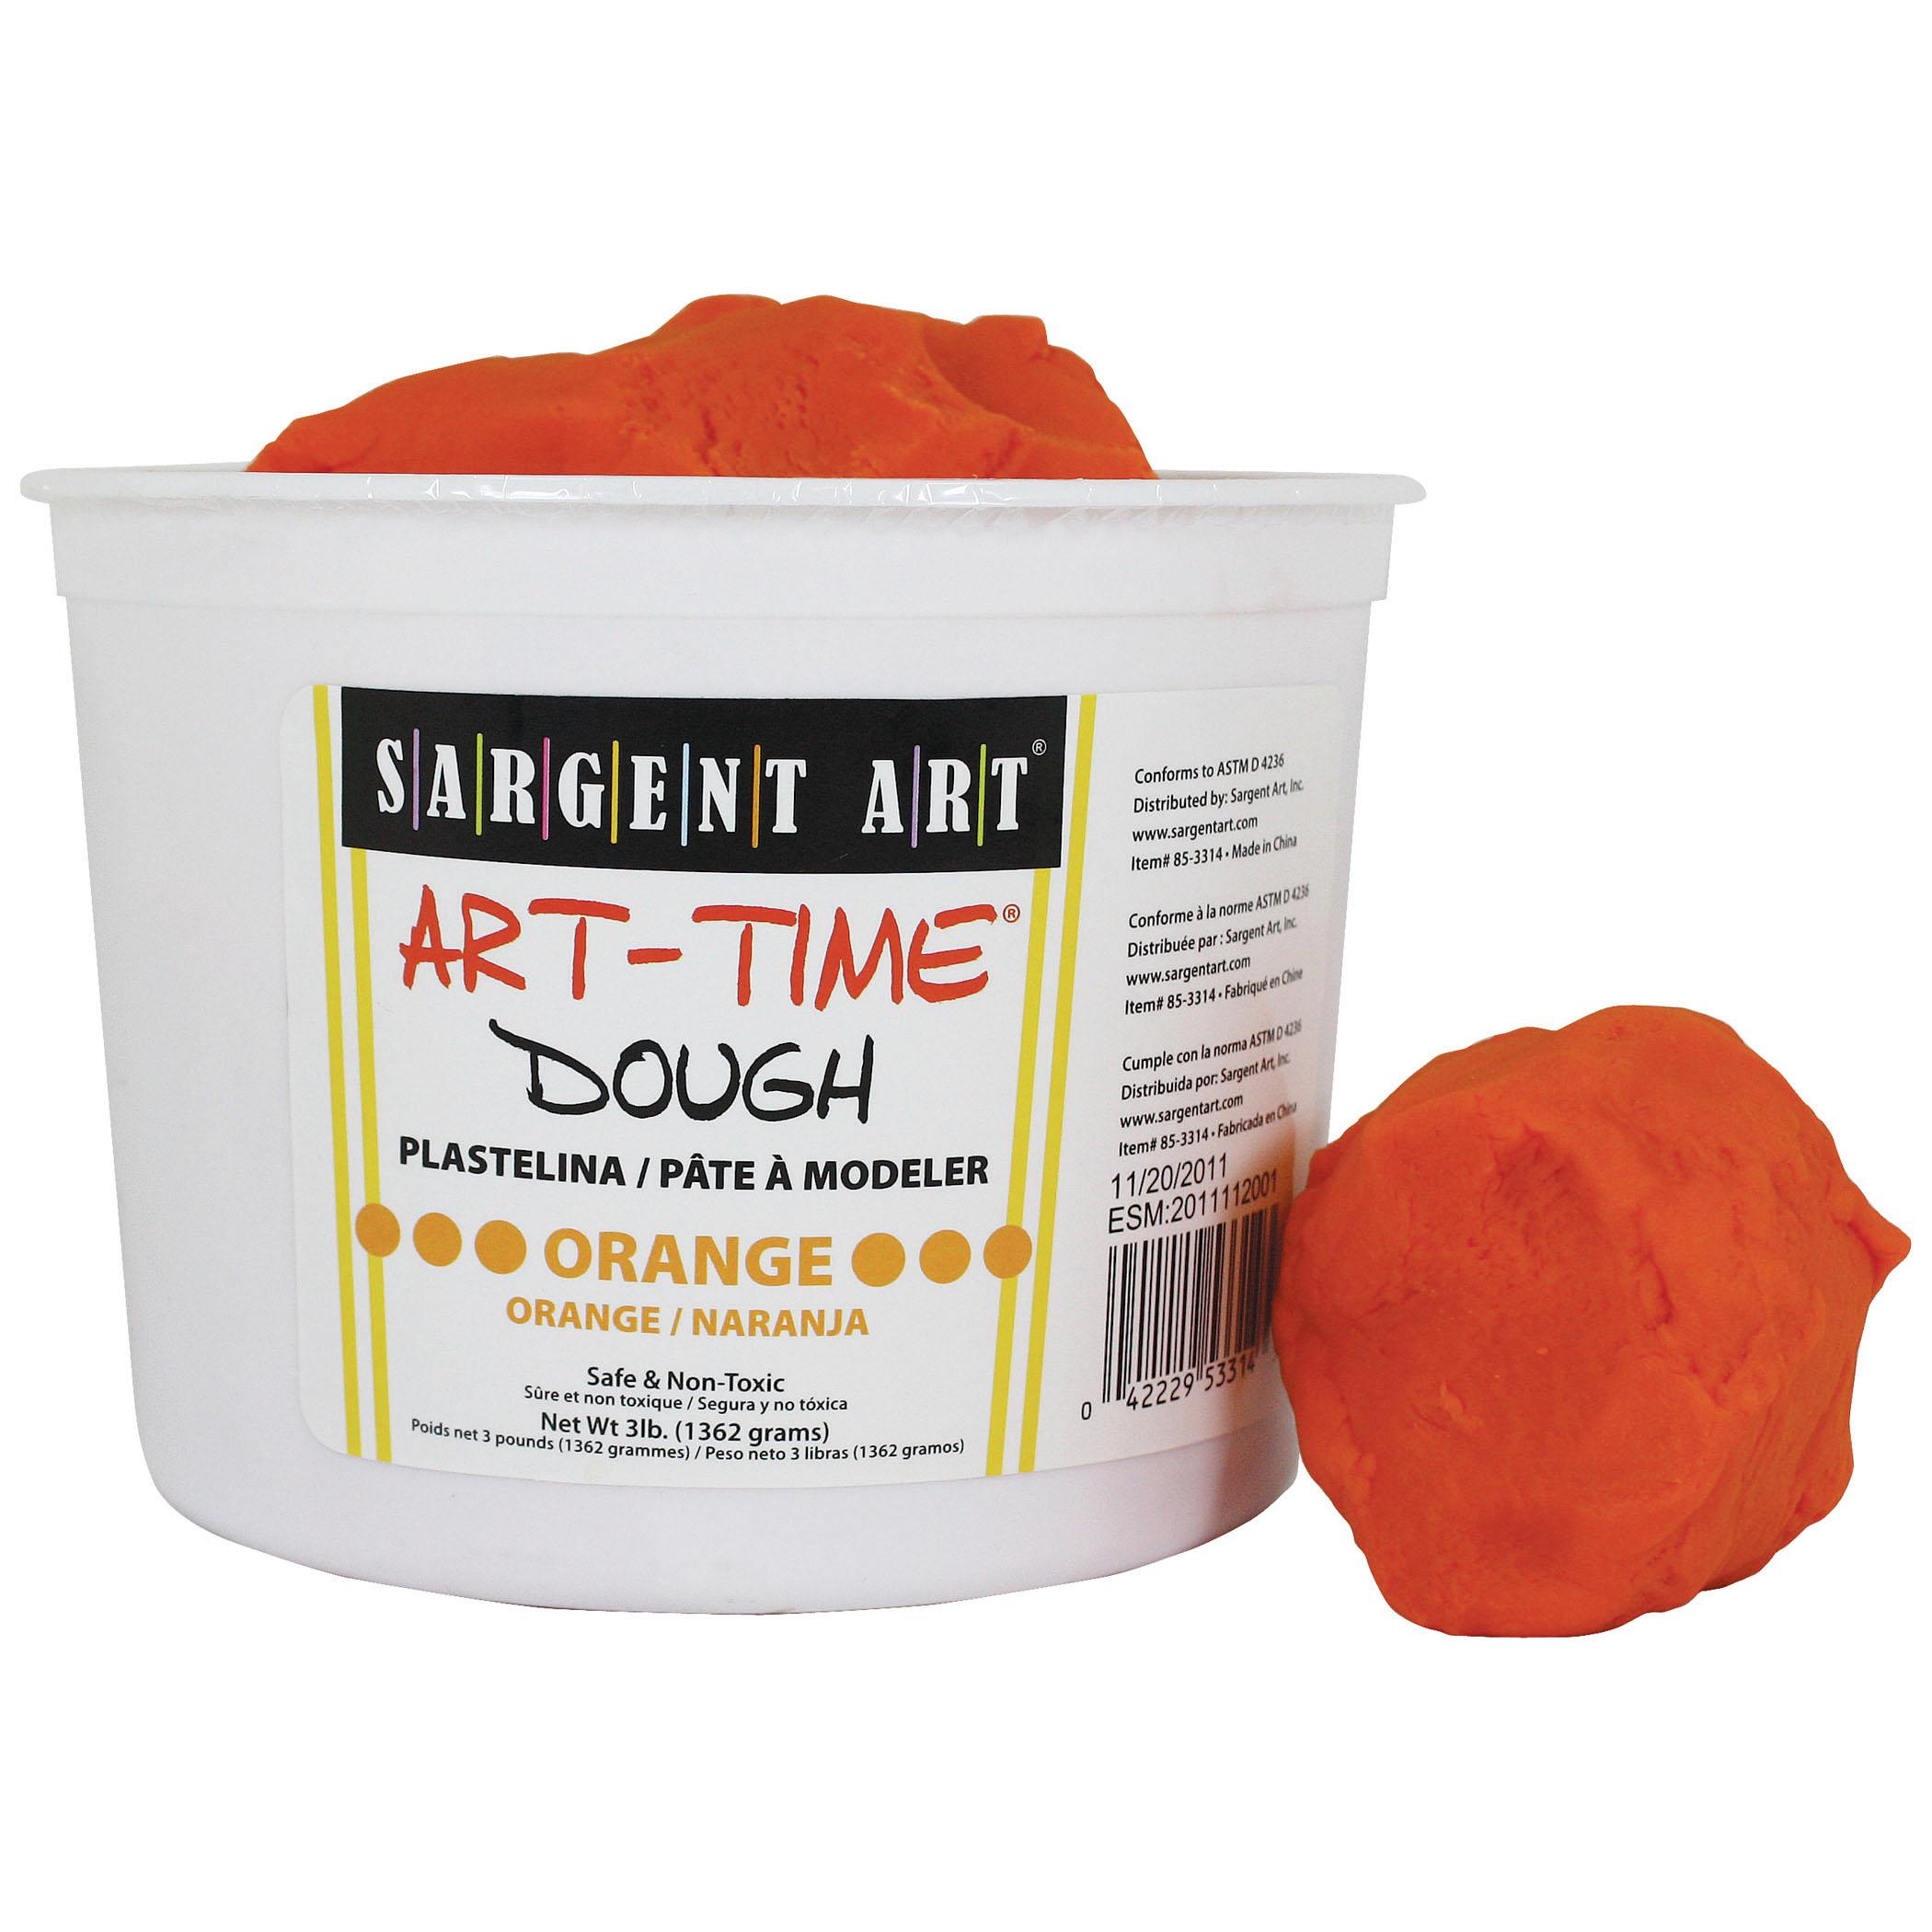 Art-Time® Dough, Orange, 3lb Tub, Pack of 3